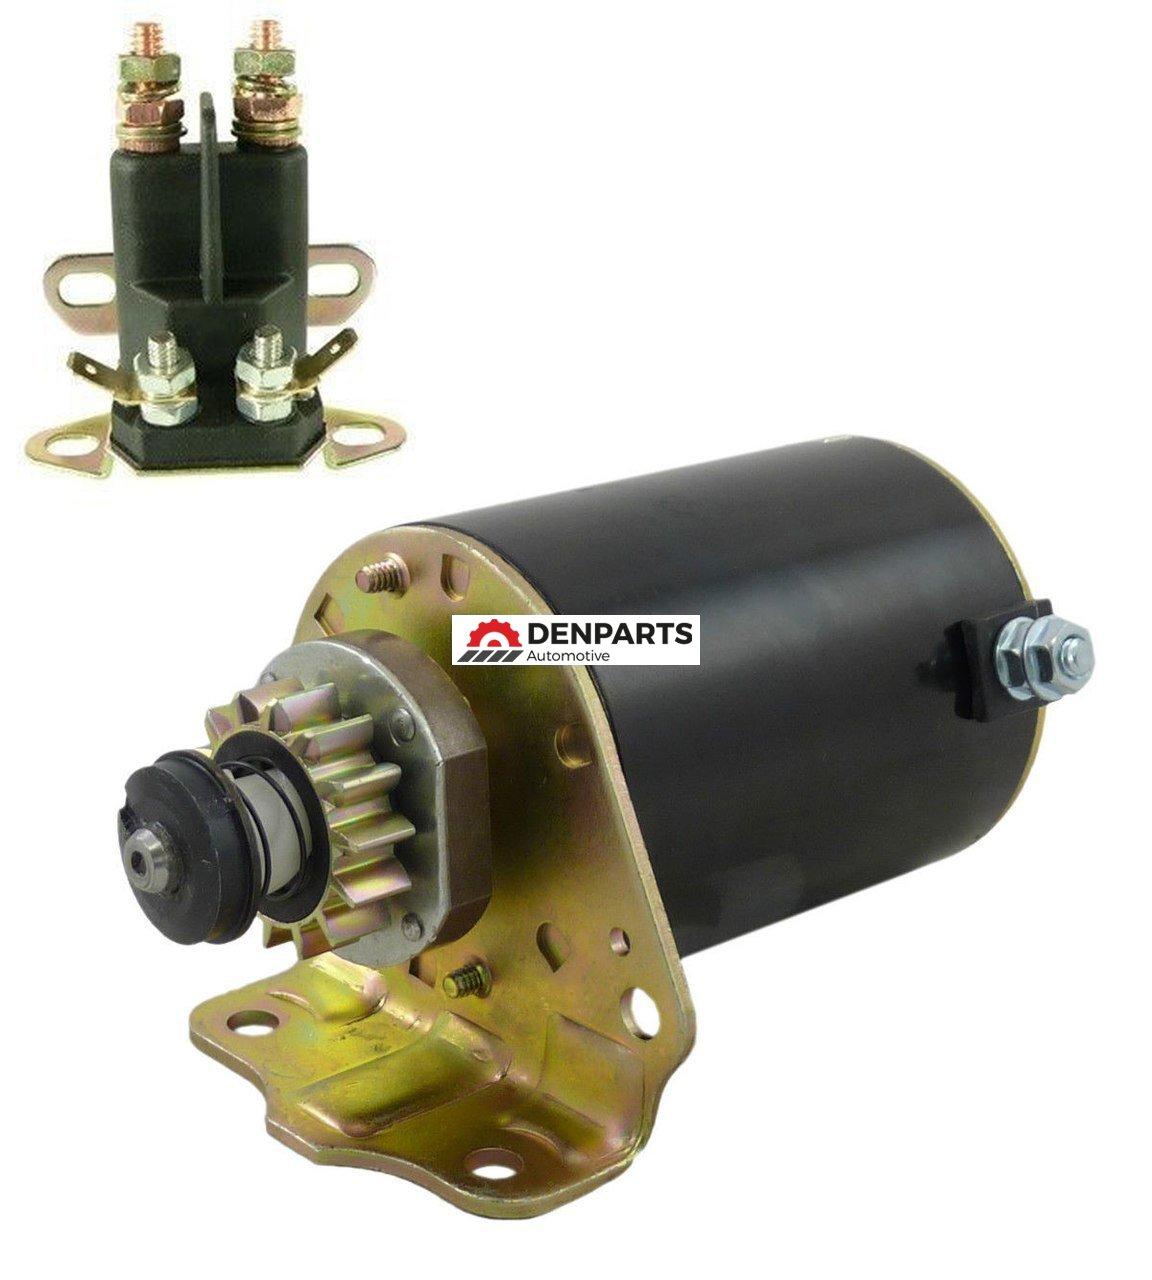 Starter Solenoid For John Deere L100 L105 L107 Briggs & Stratton LG693551